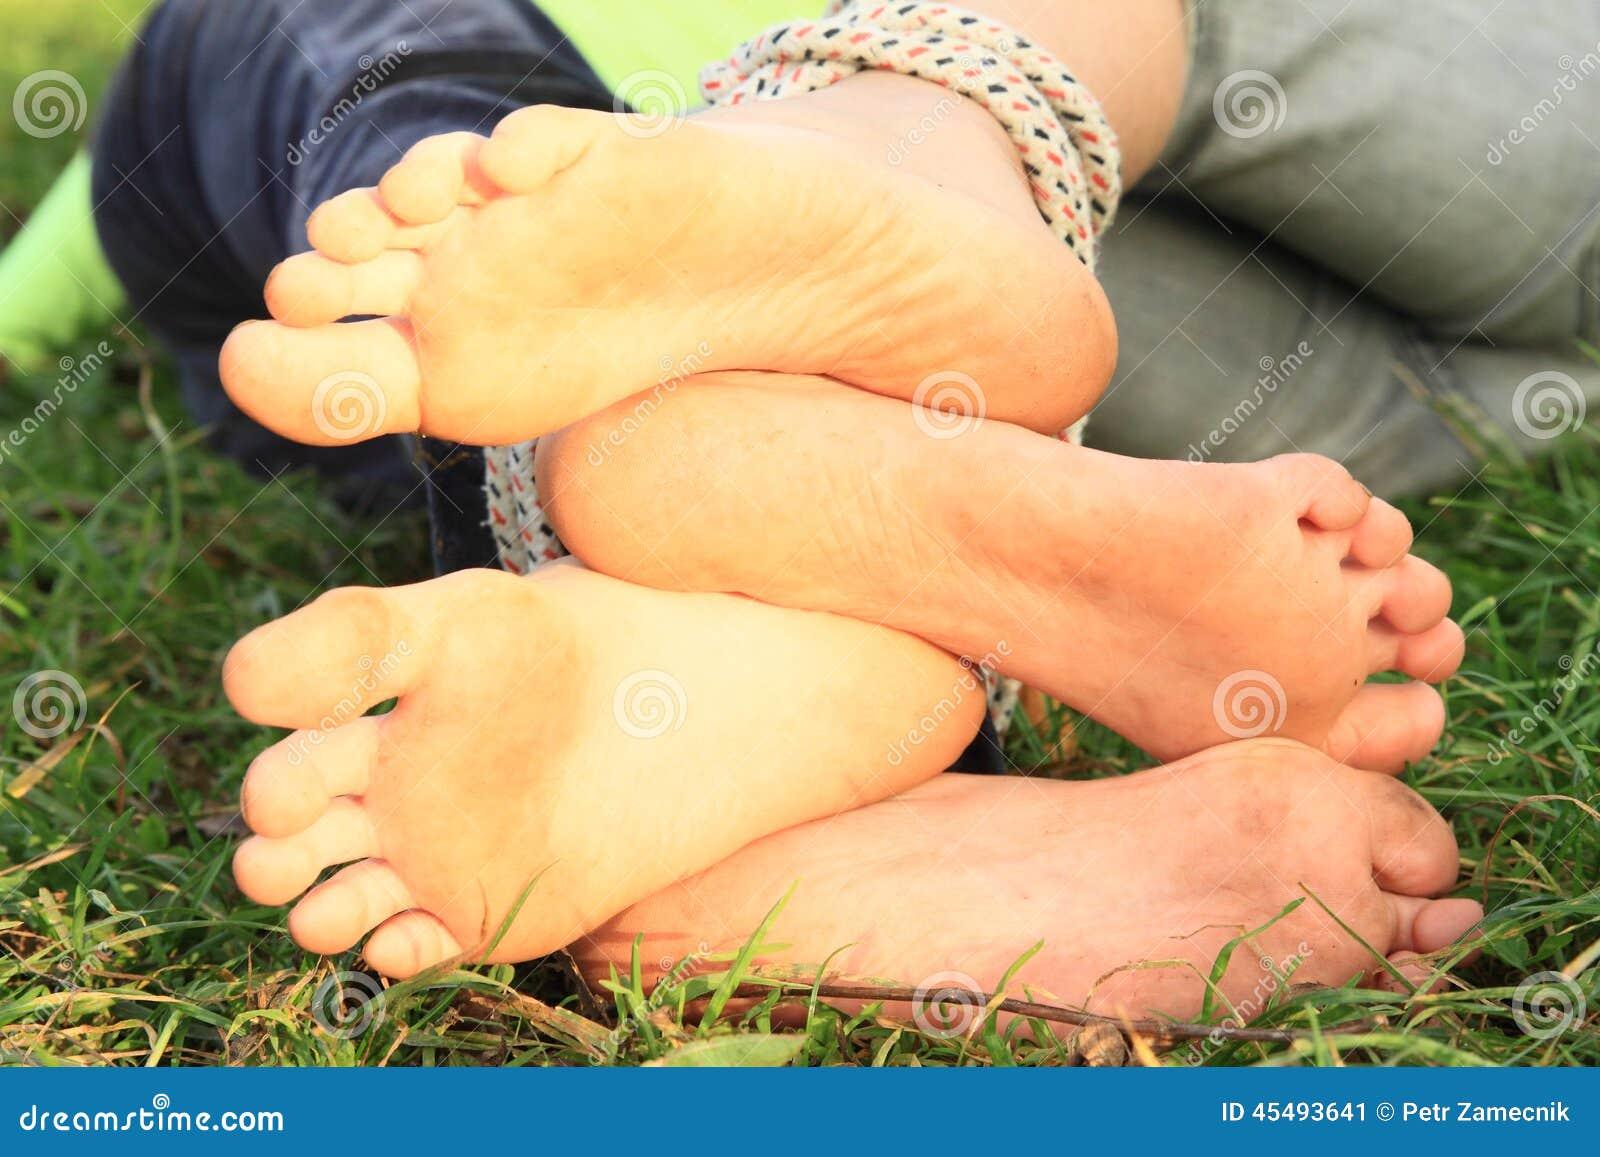 Tied Feet Bare 116